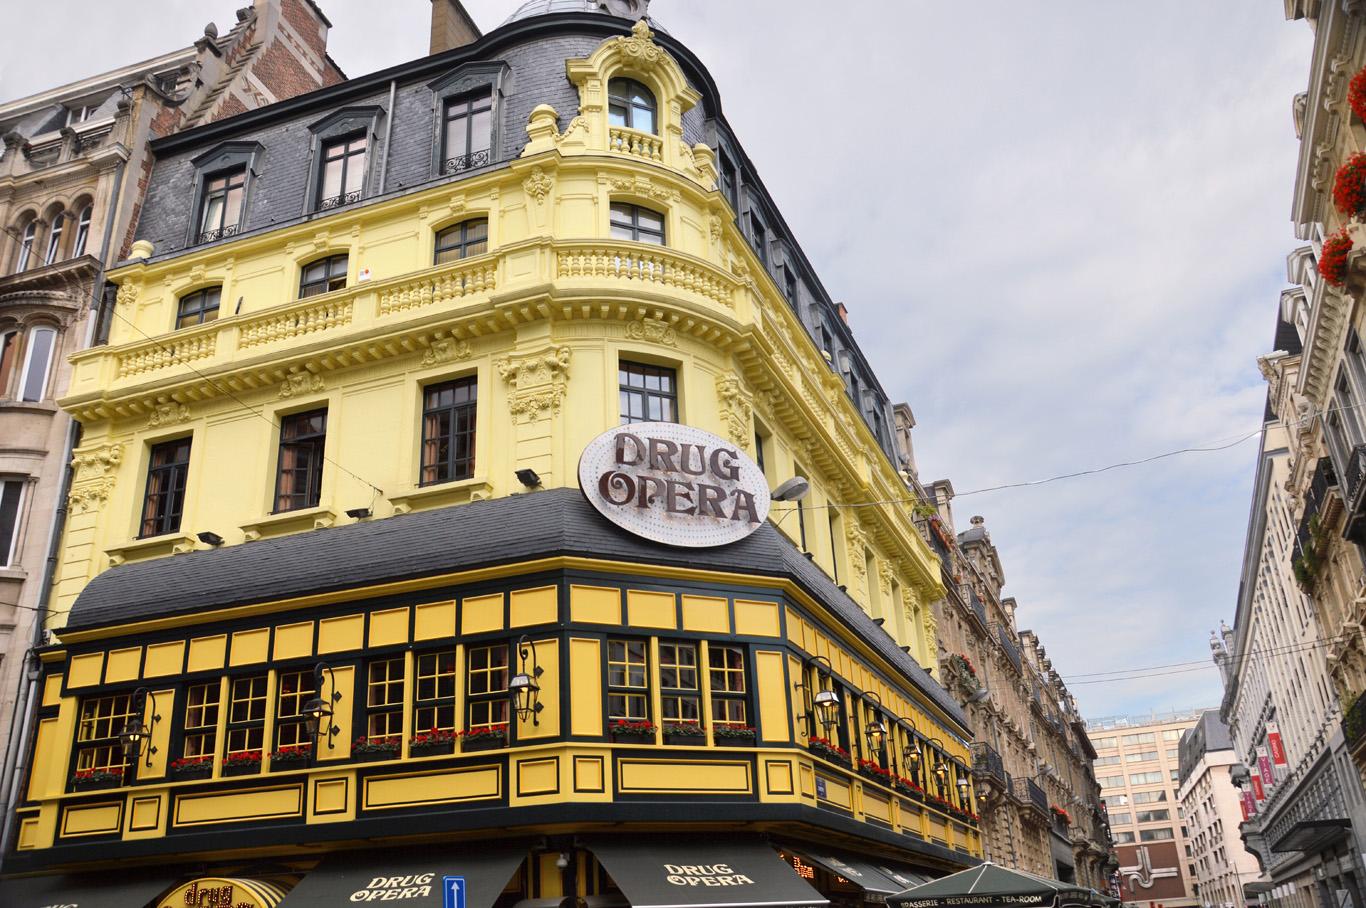 Drug Opera - bar/restaurant